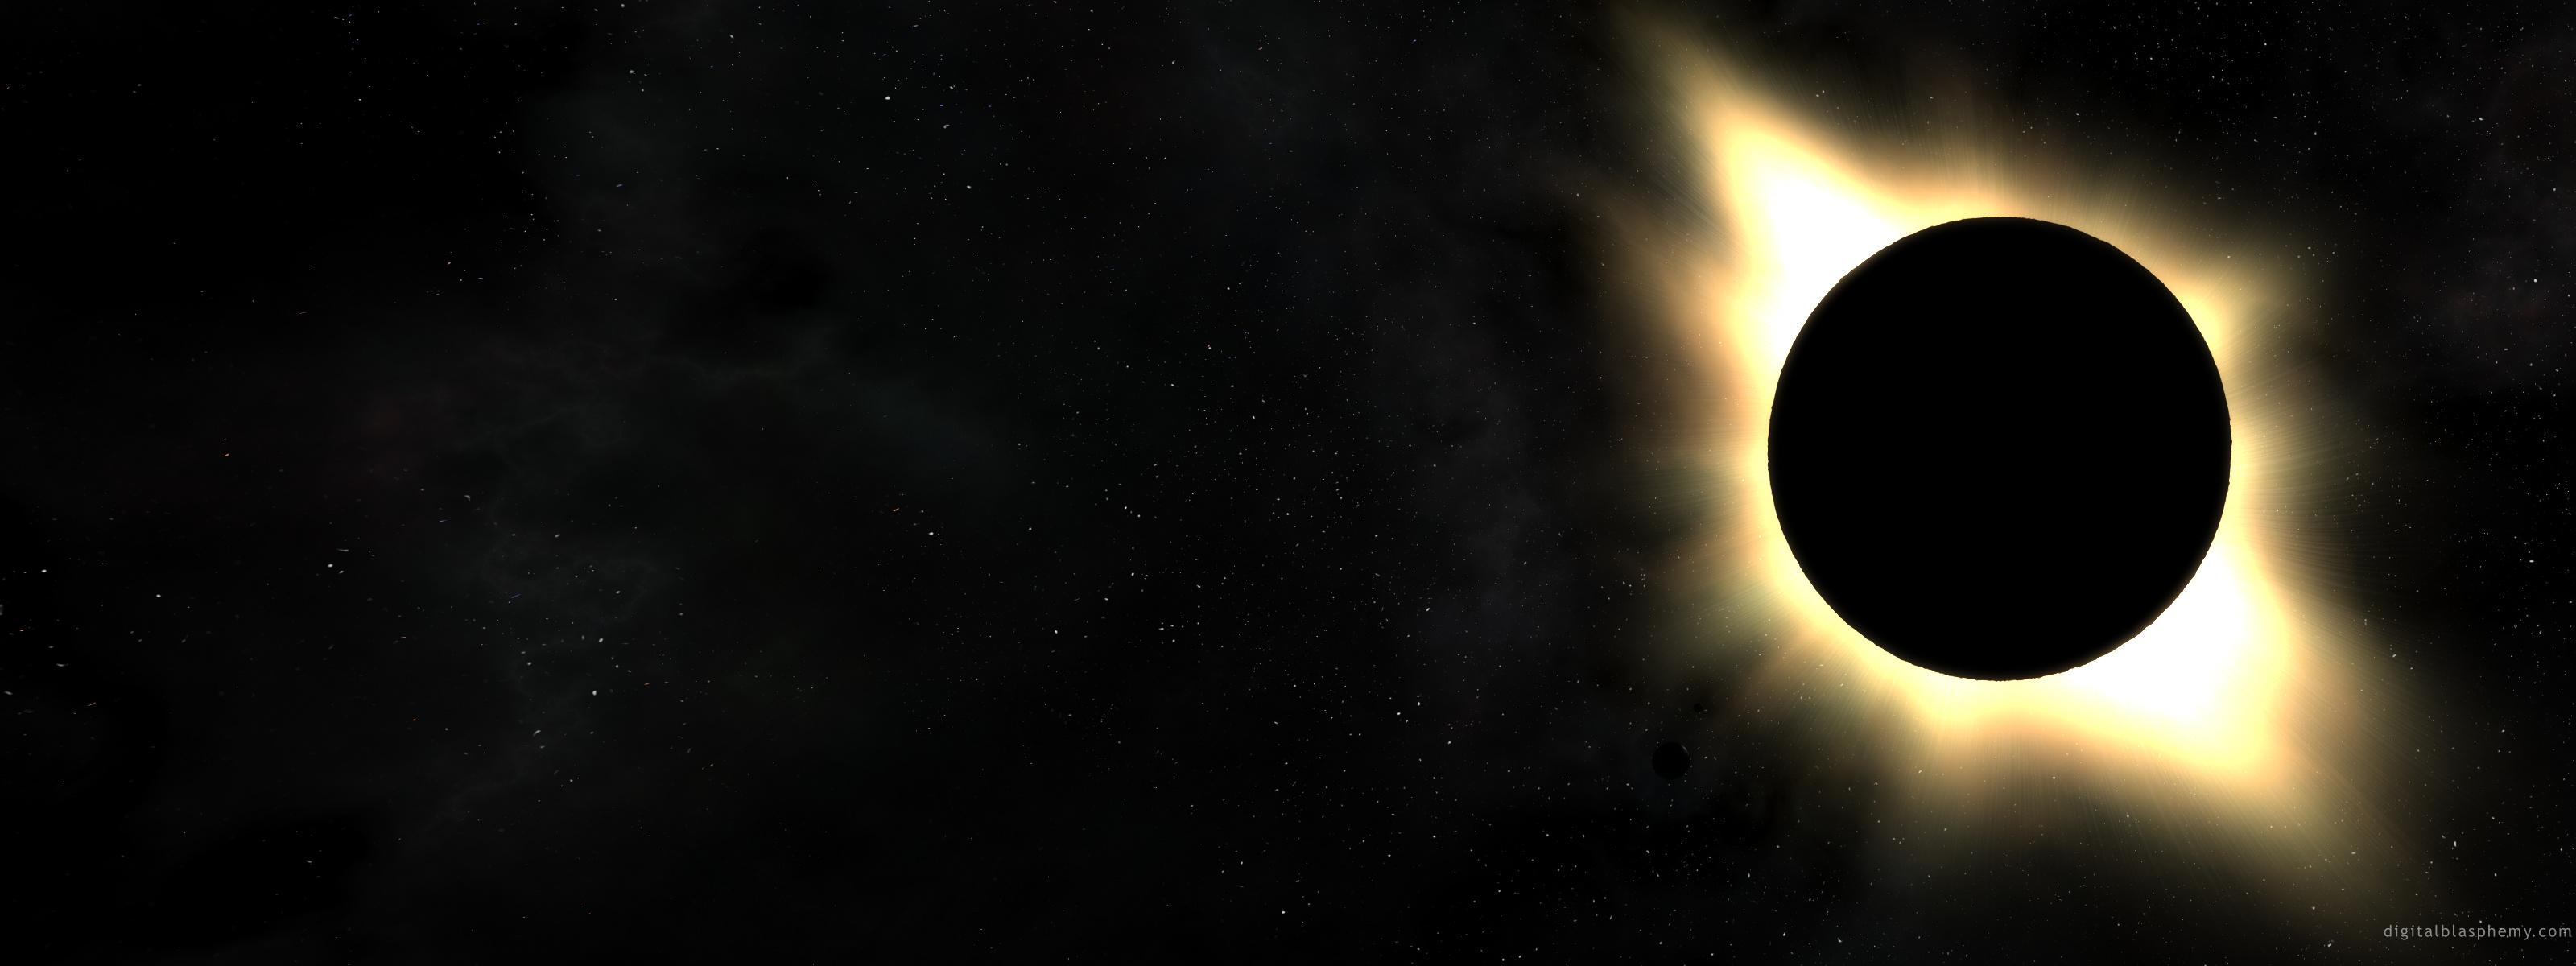 Солнечное затмение на 2 монитора 3200x1200 583KB Космос